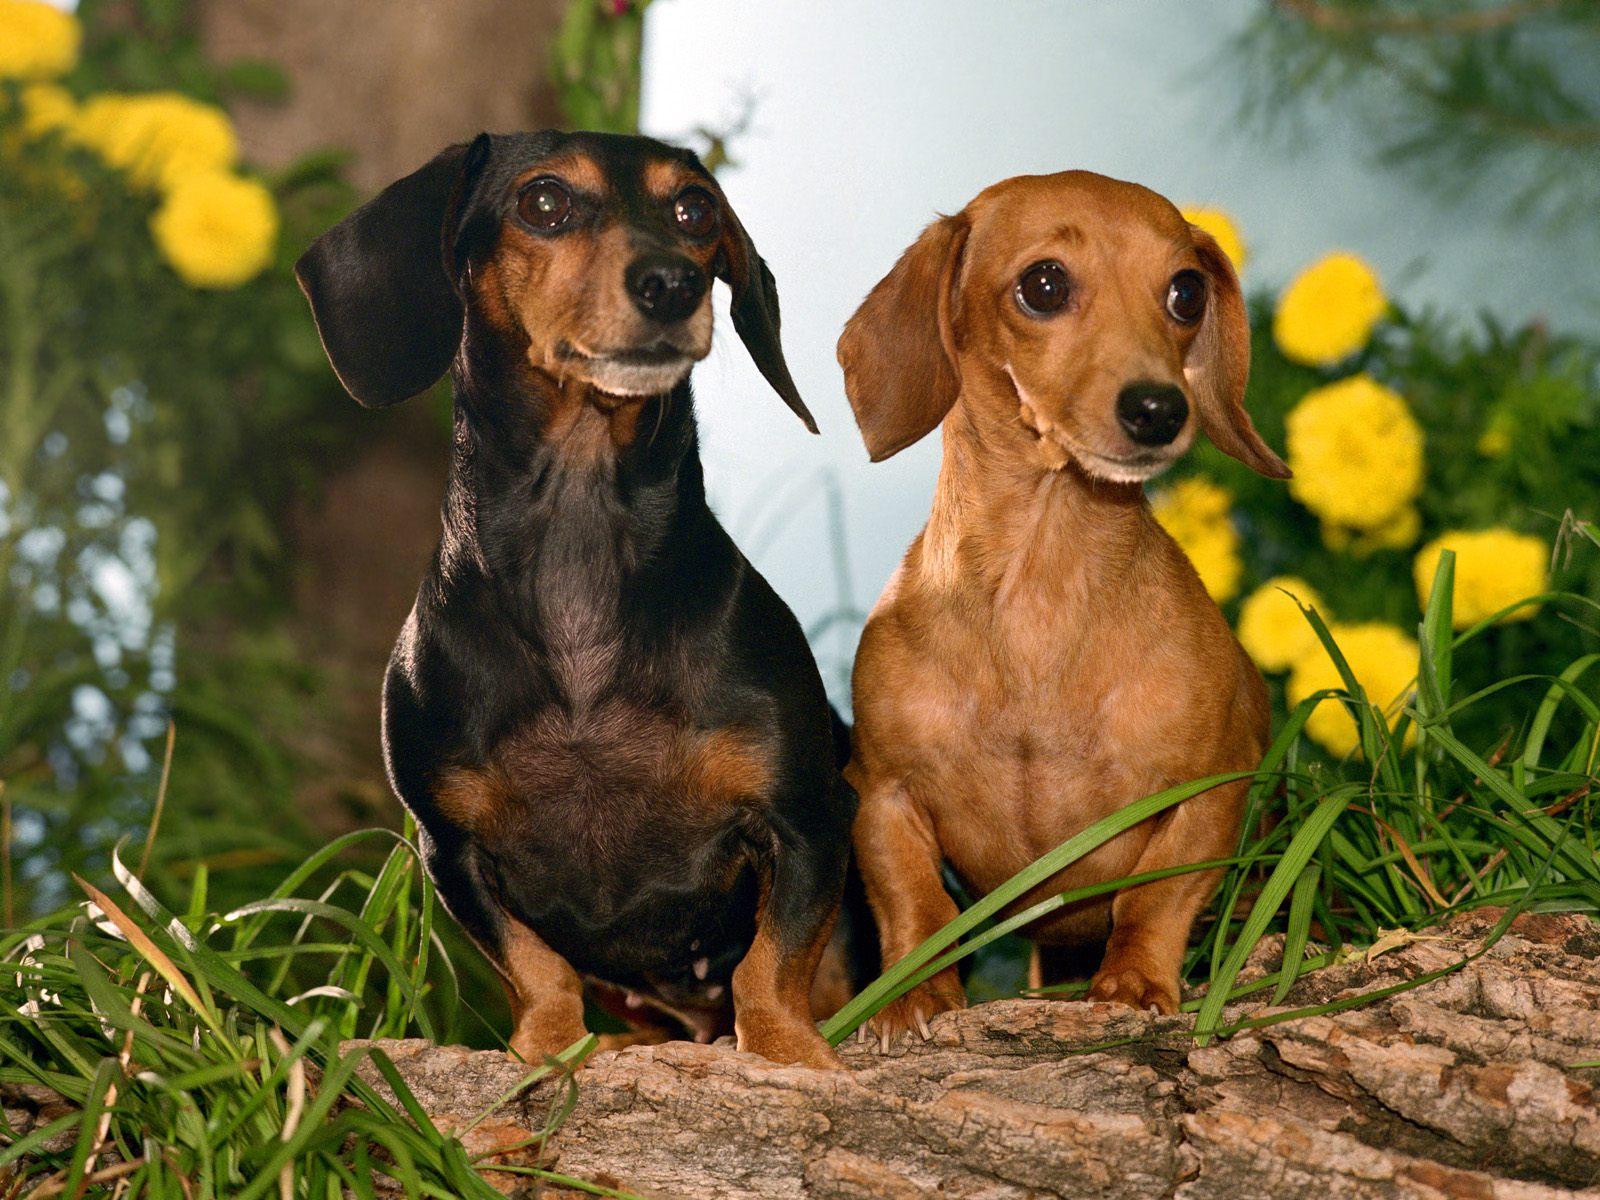 Dachshund Dog: Dachshund Dachshund Dogs Breed